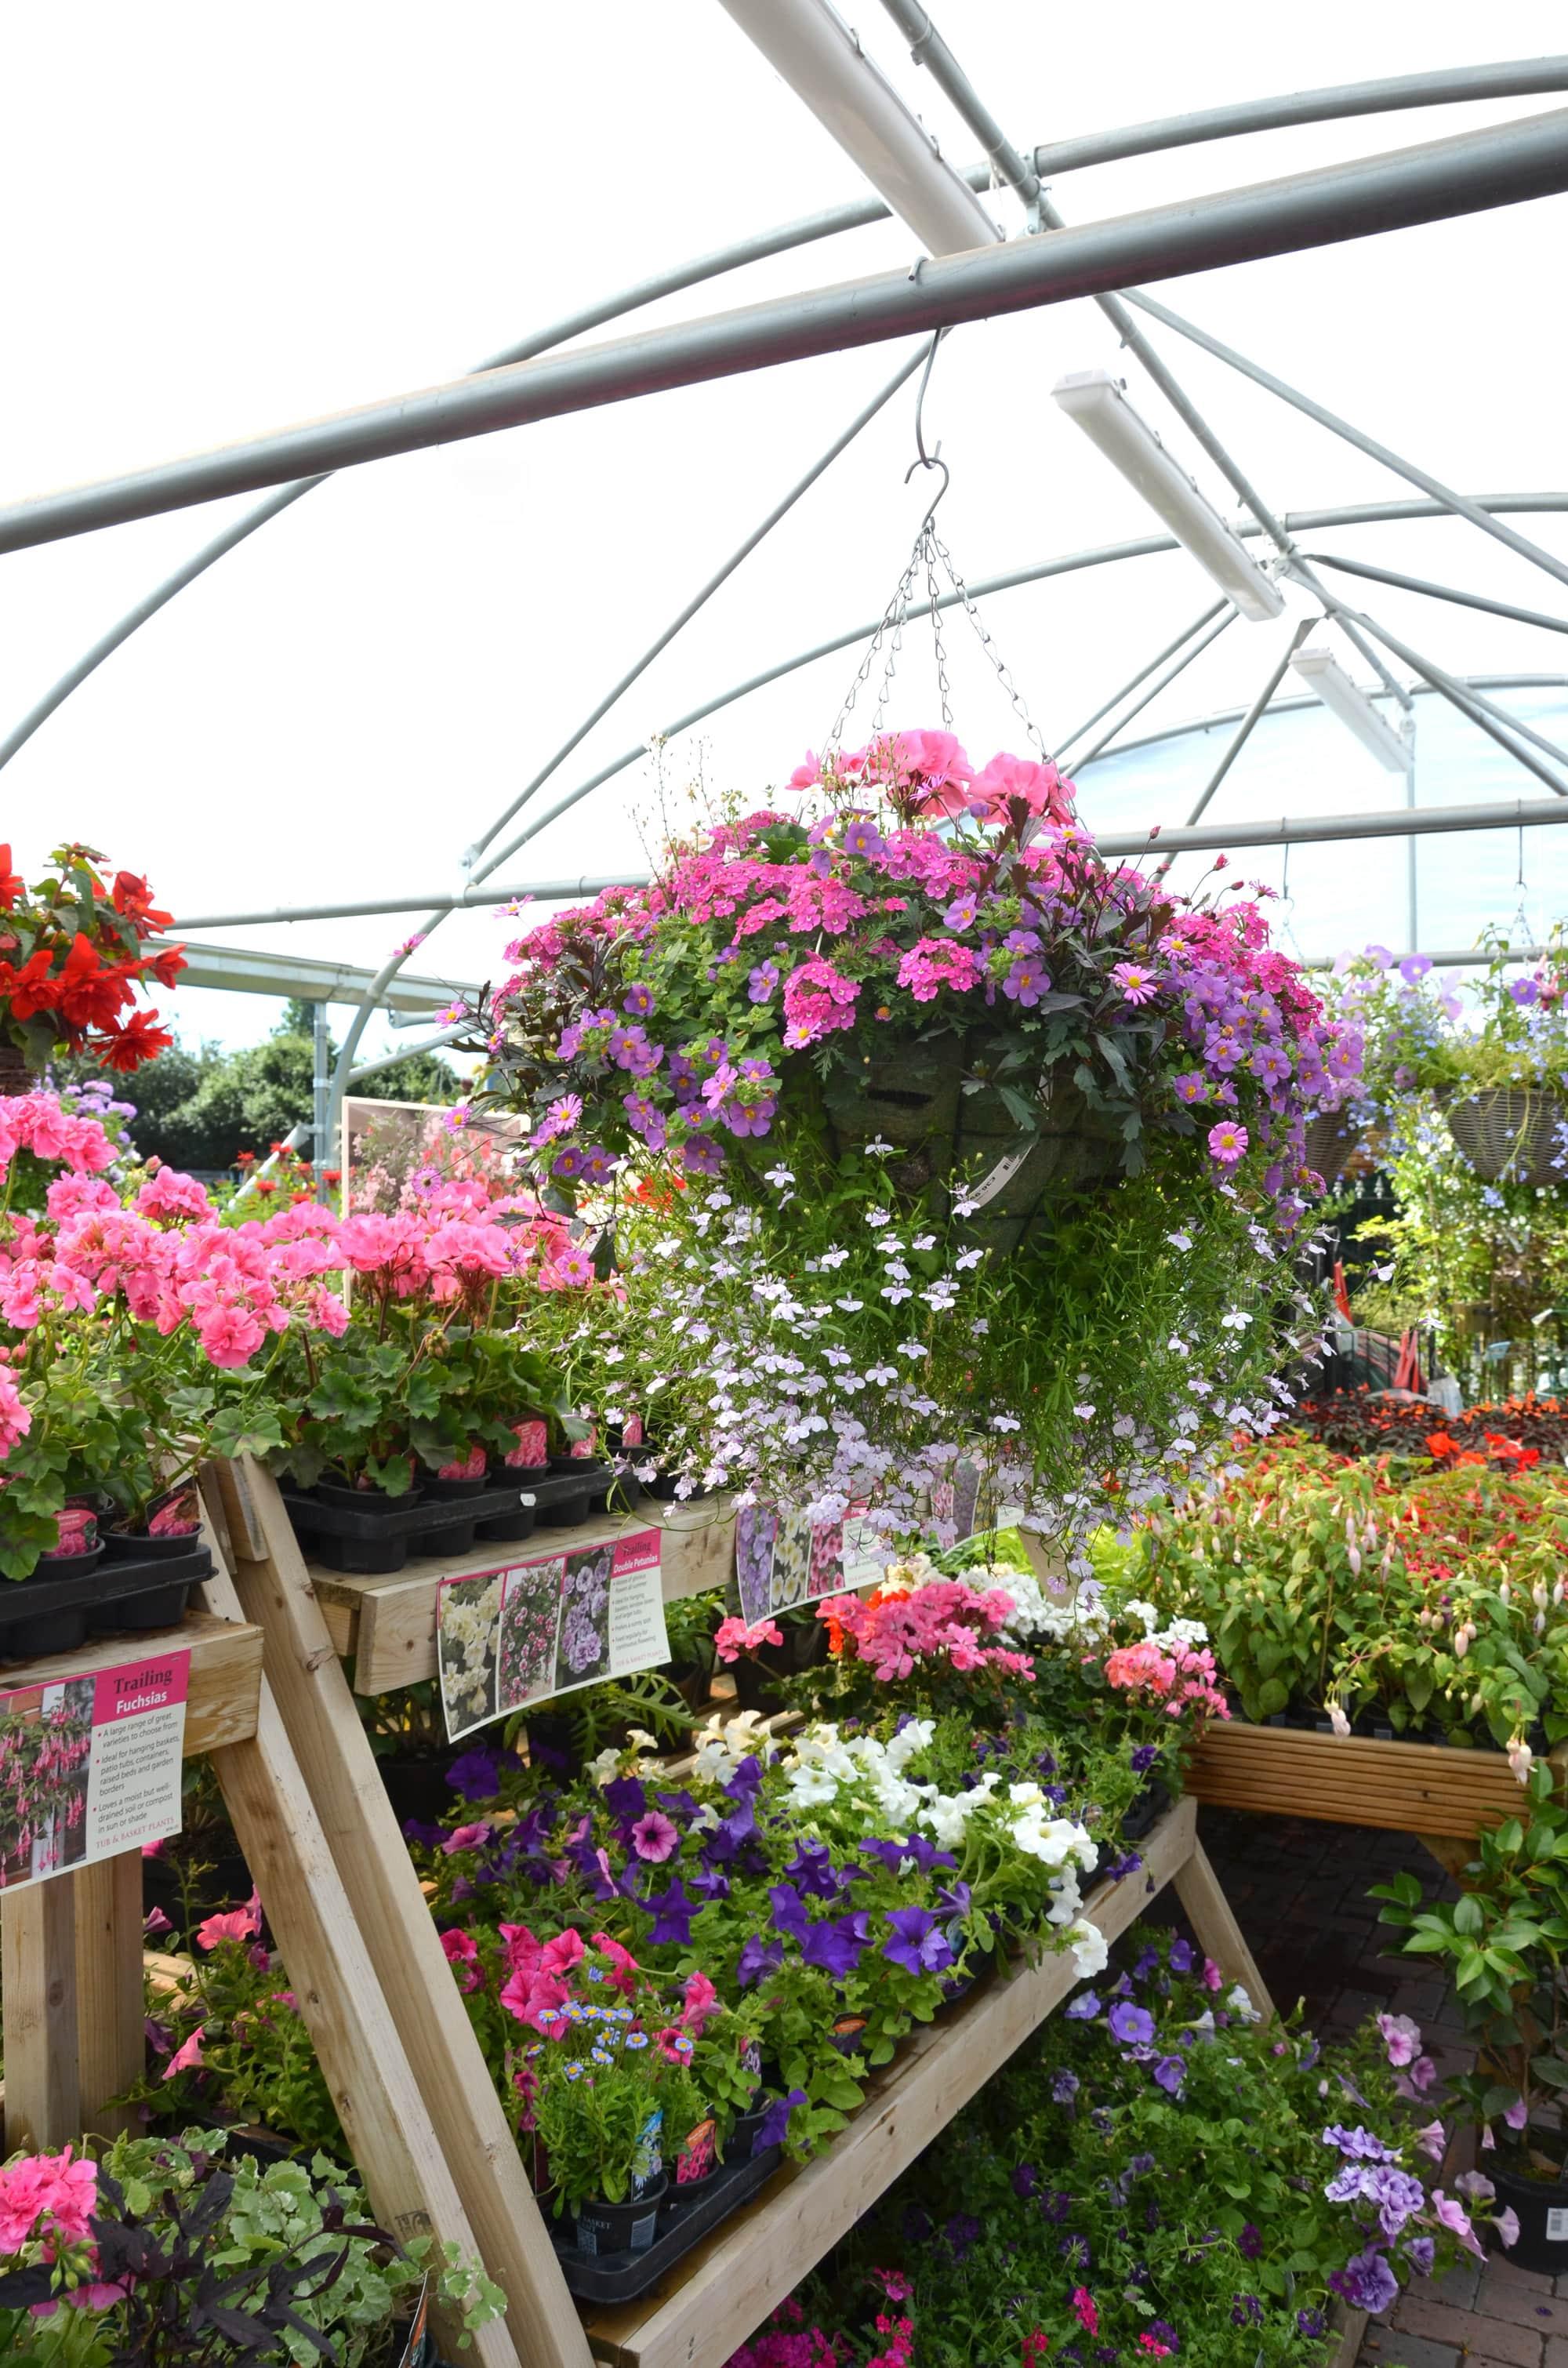 Lower-barn-gardencentre-flowers-min.jpg